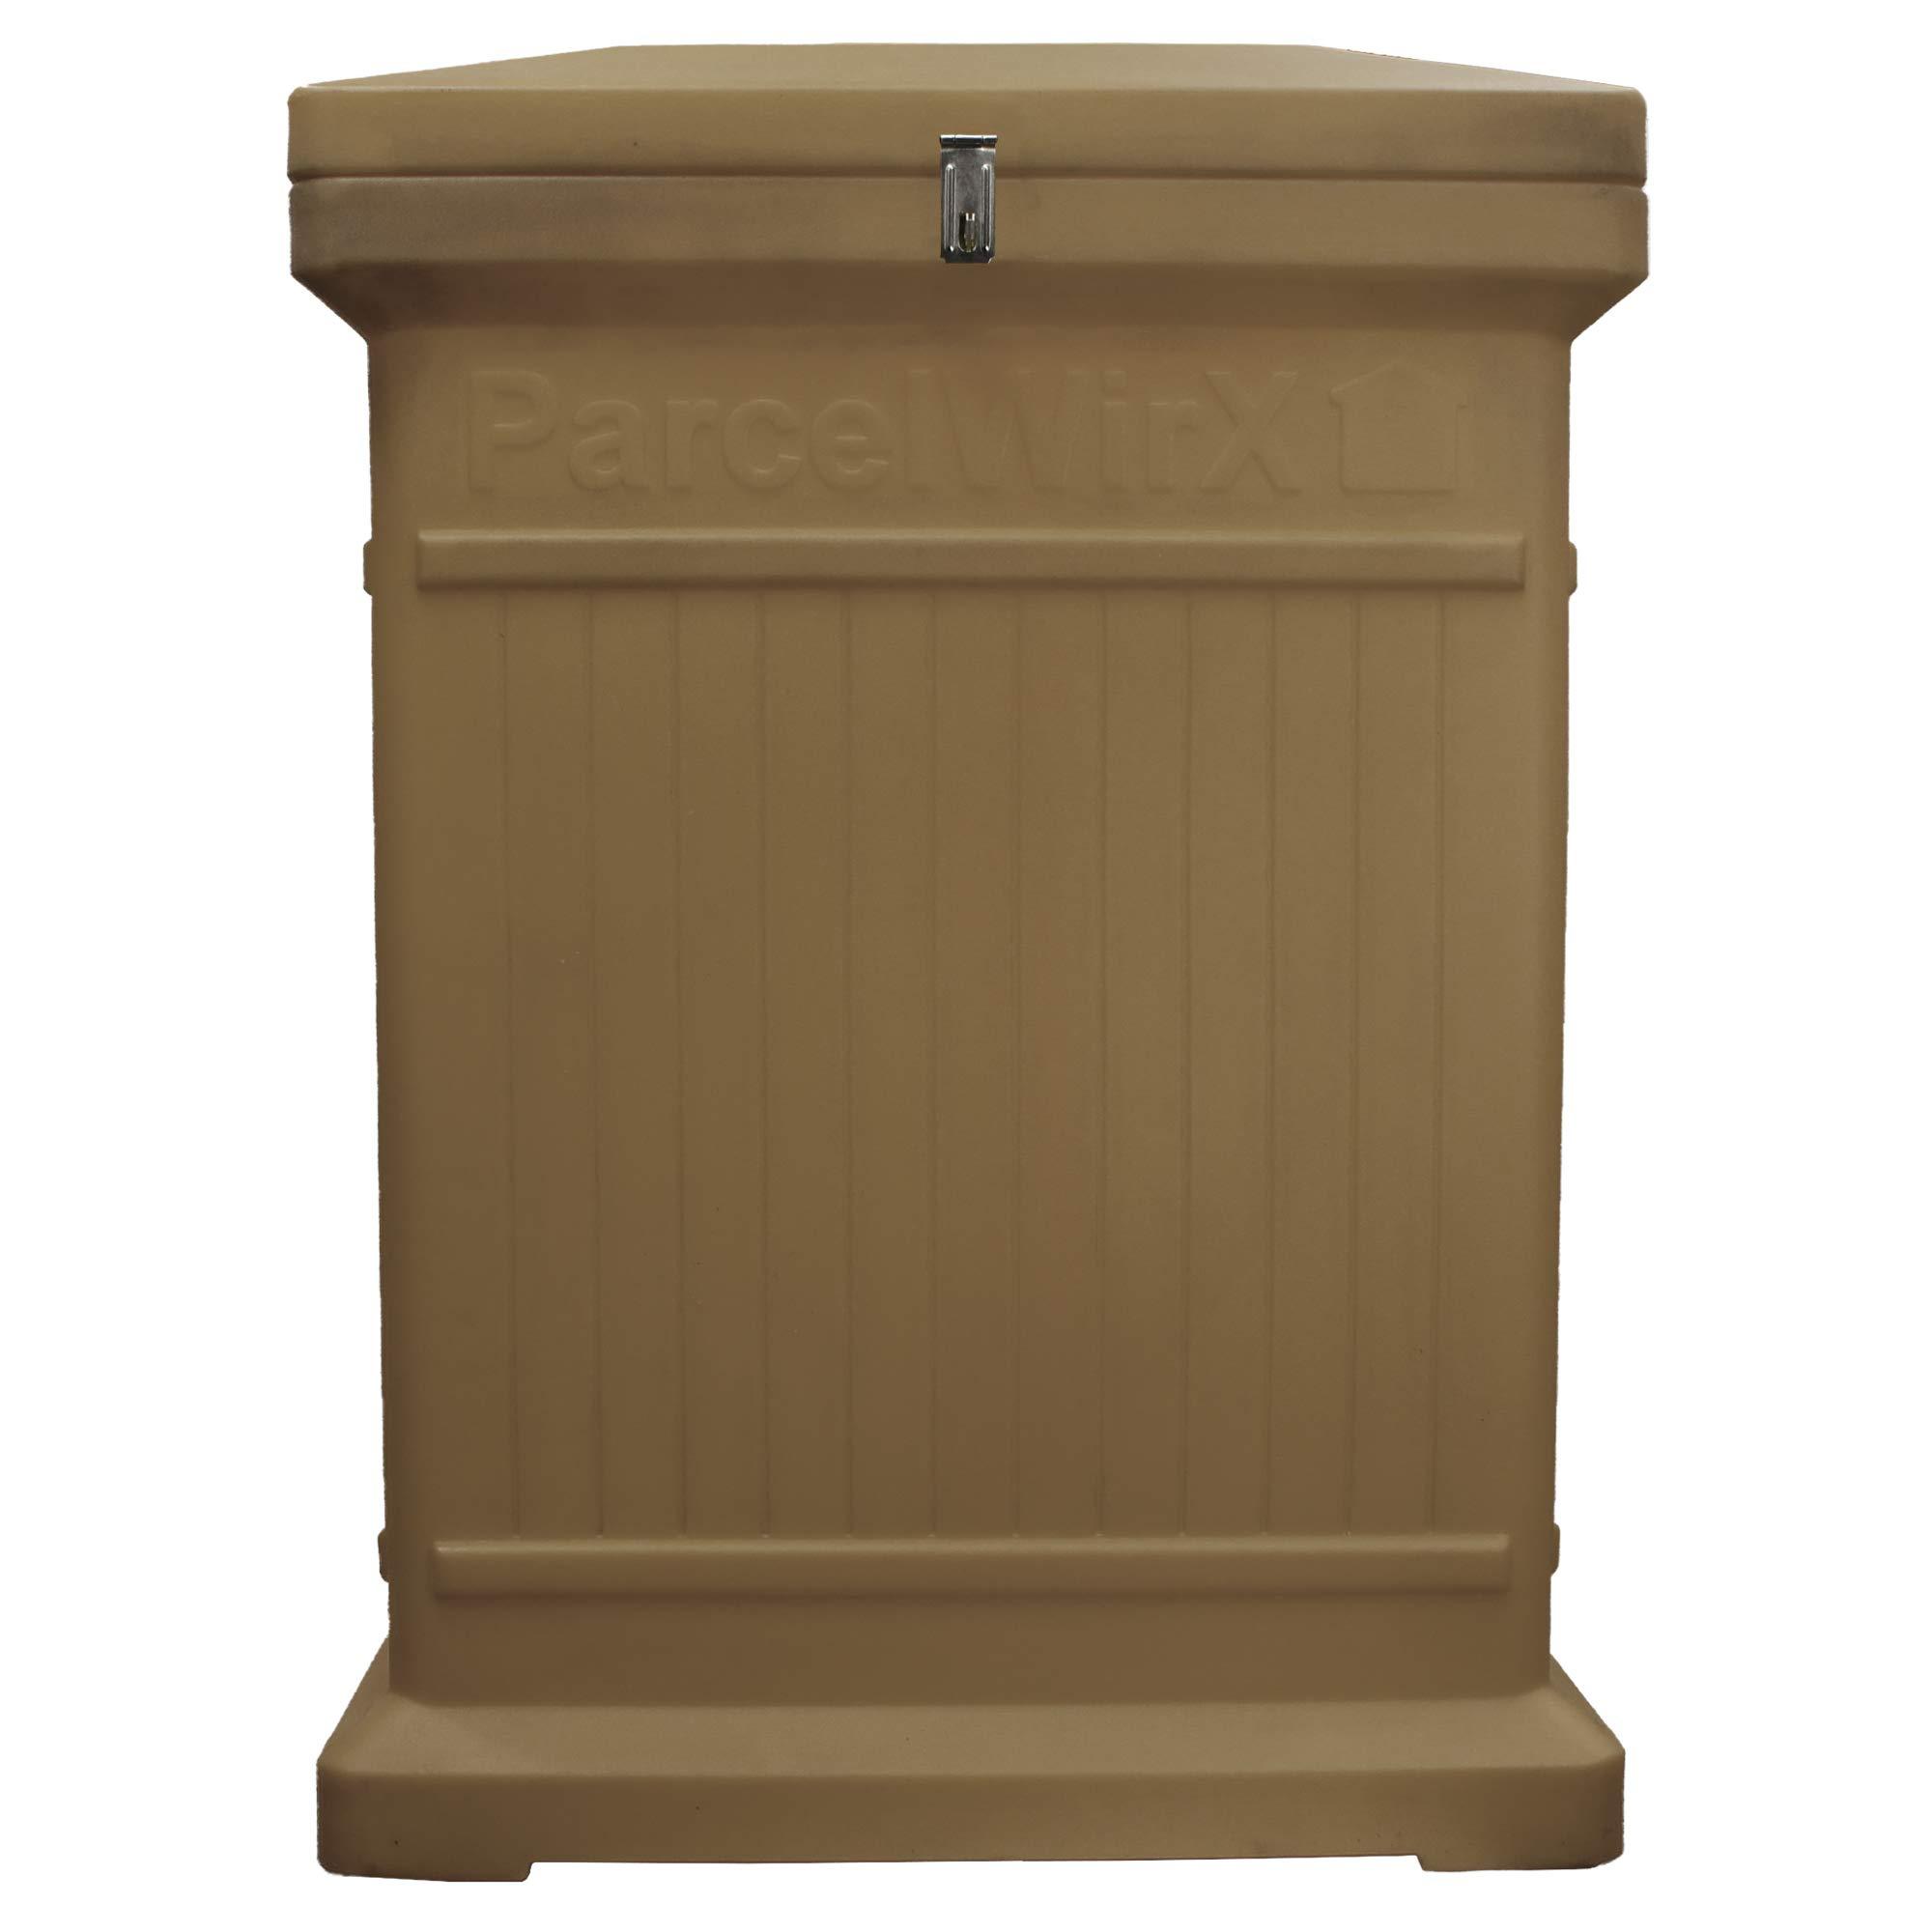 RTS Companies Inc. 550200400A5481 Parcelwirx Premium Vertical Delivery Drop Box w/Hinged Lid, Oak